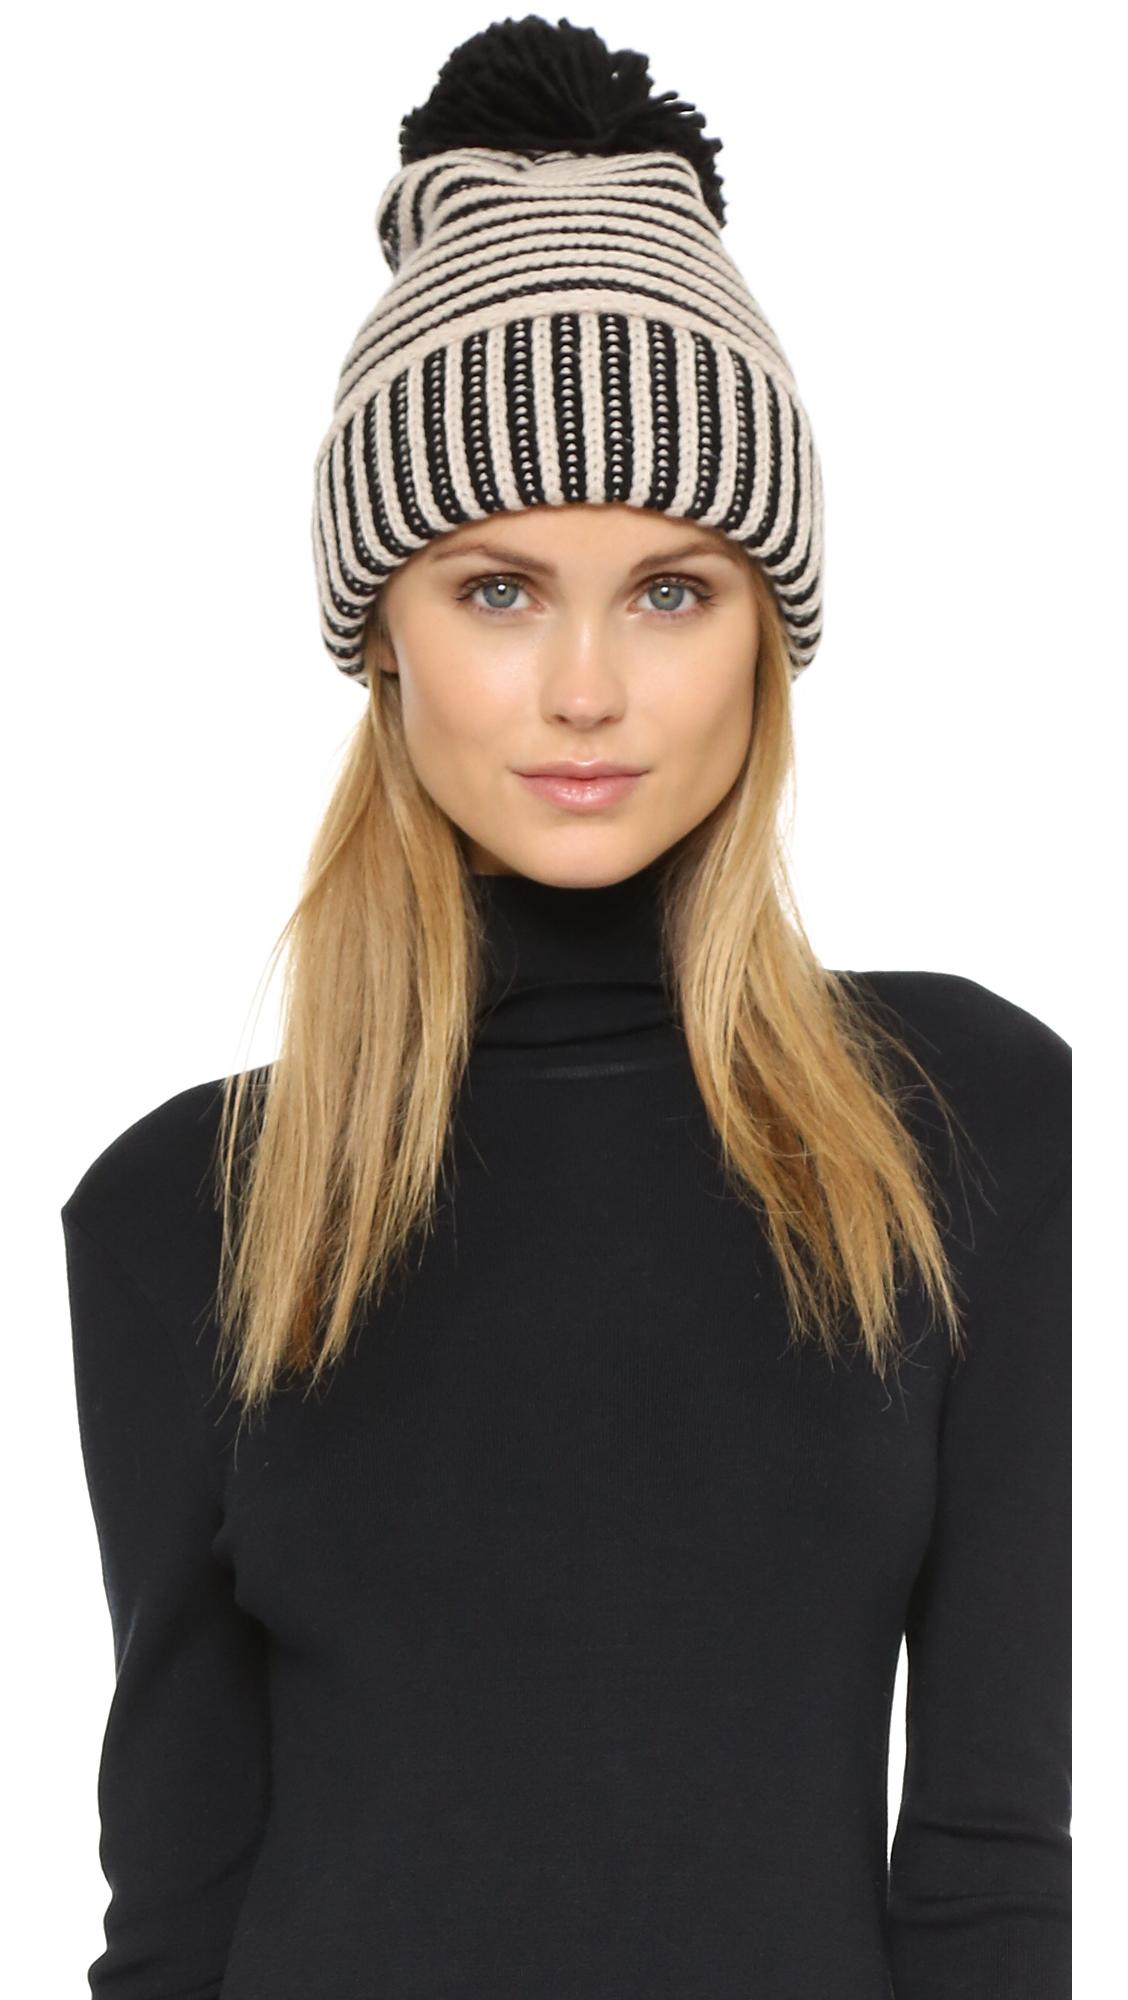 86d19b02f47c9 where can i buy veil hats kate spade 33894 4f50f